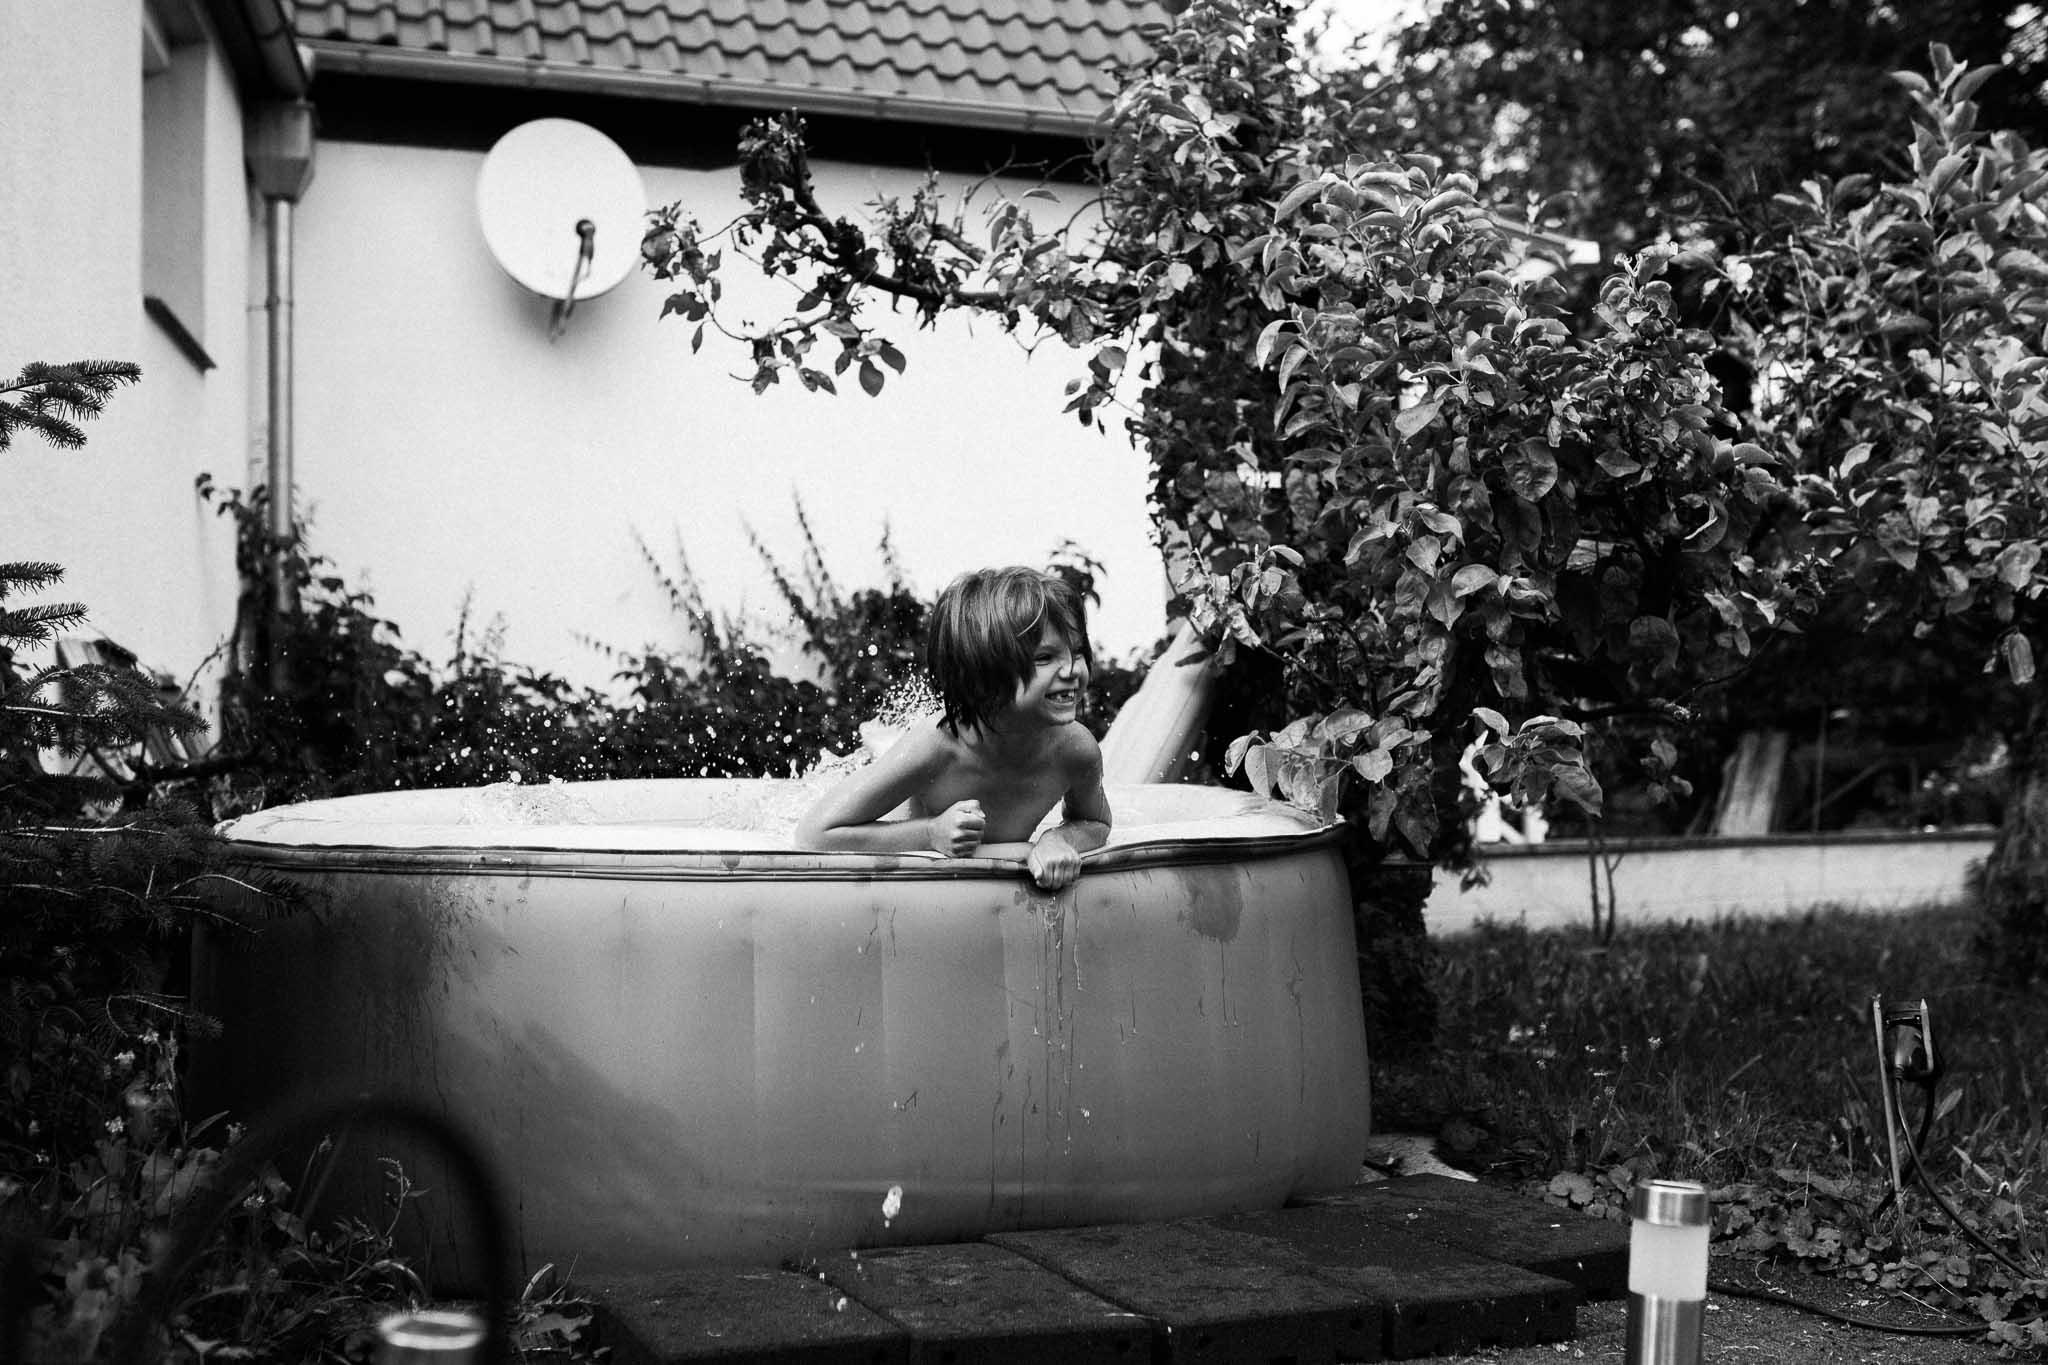 Mädchen planscht im Planschbecken im Garten